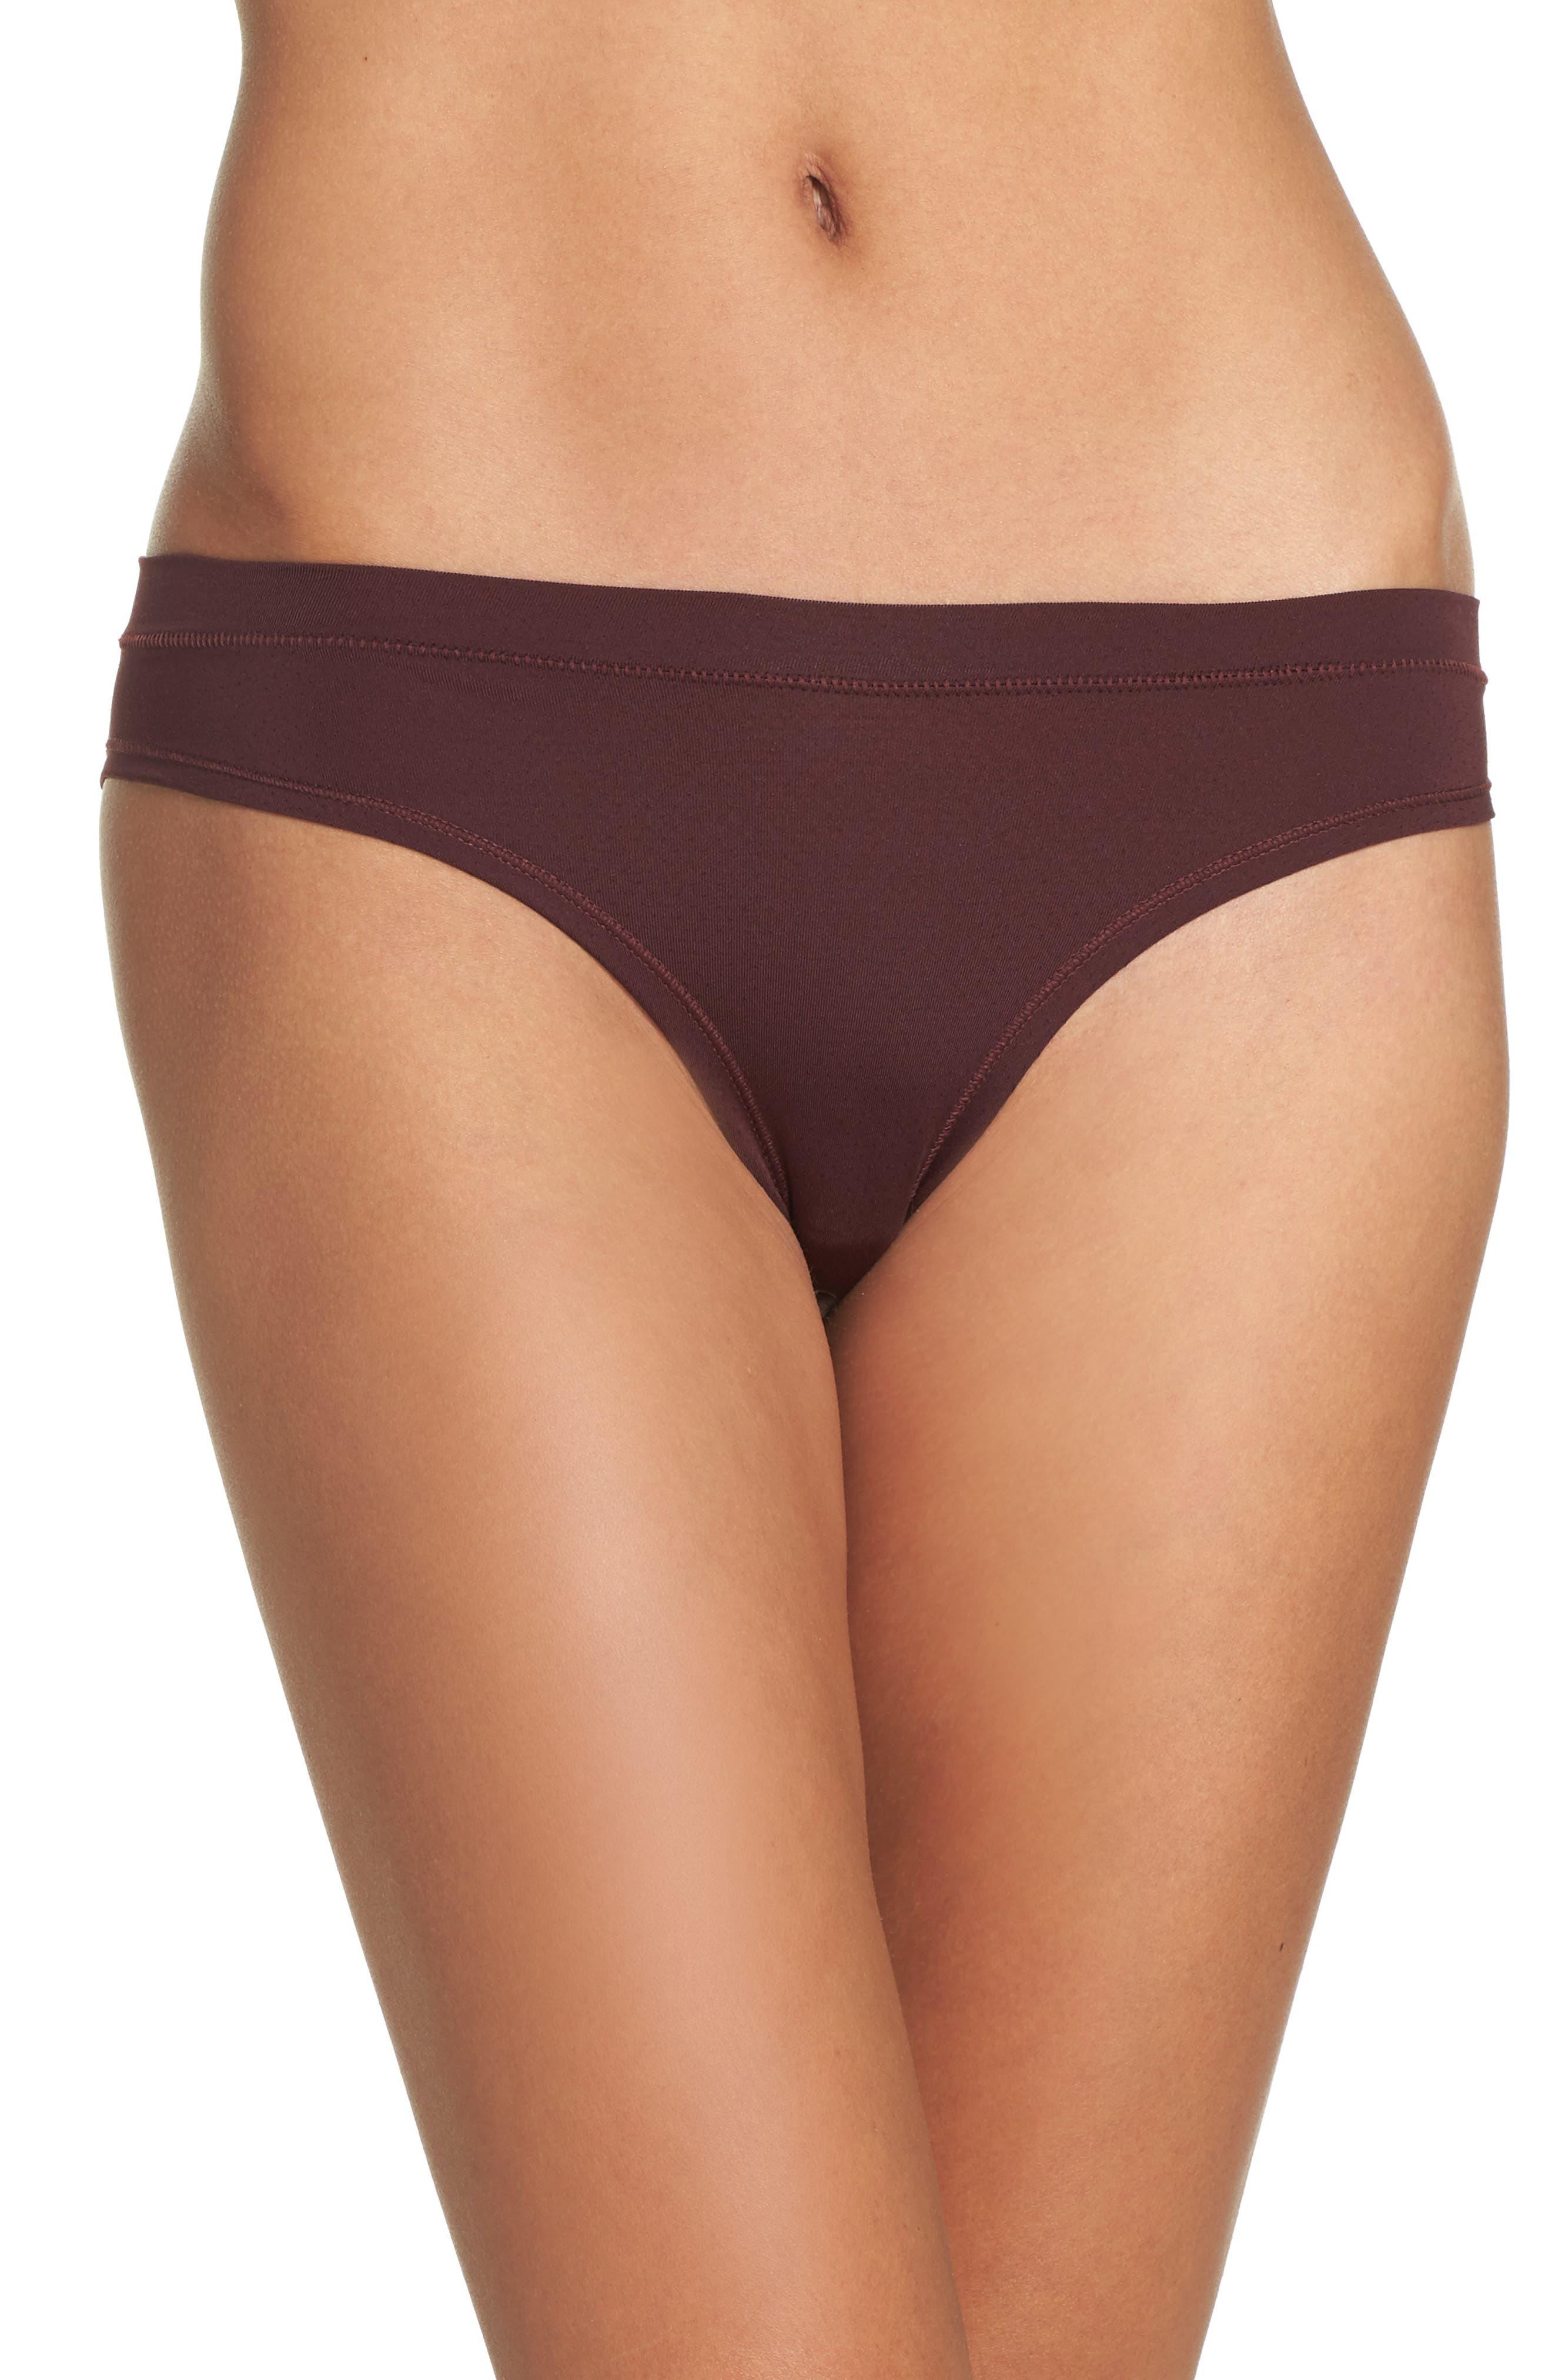 Zella Body Mesh Active Bikini (4 for $30)